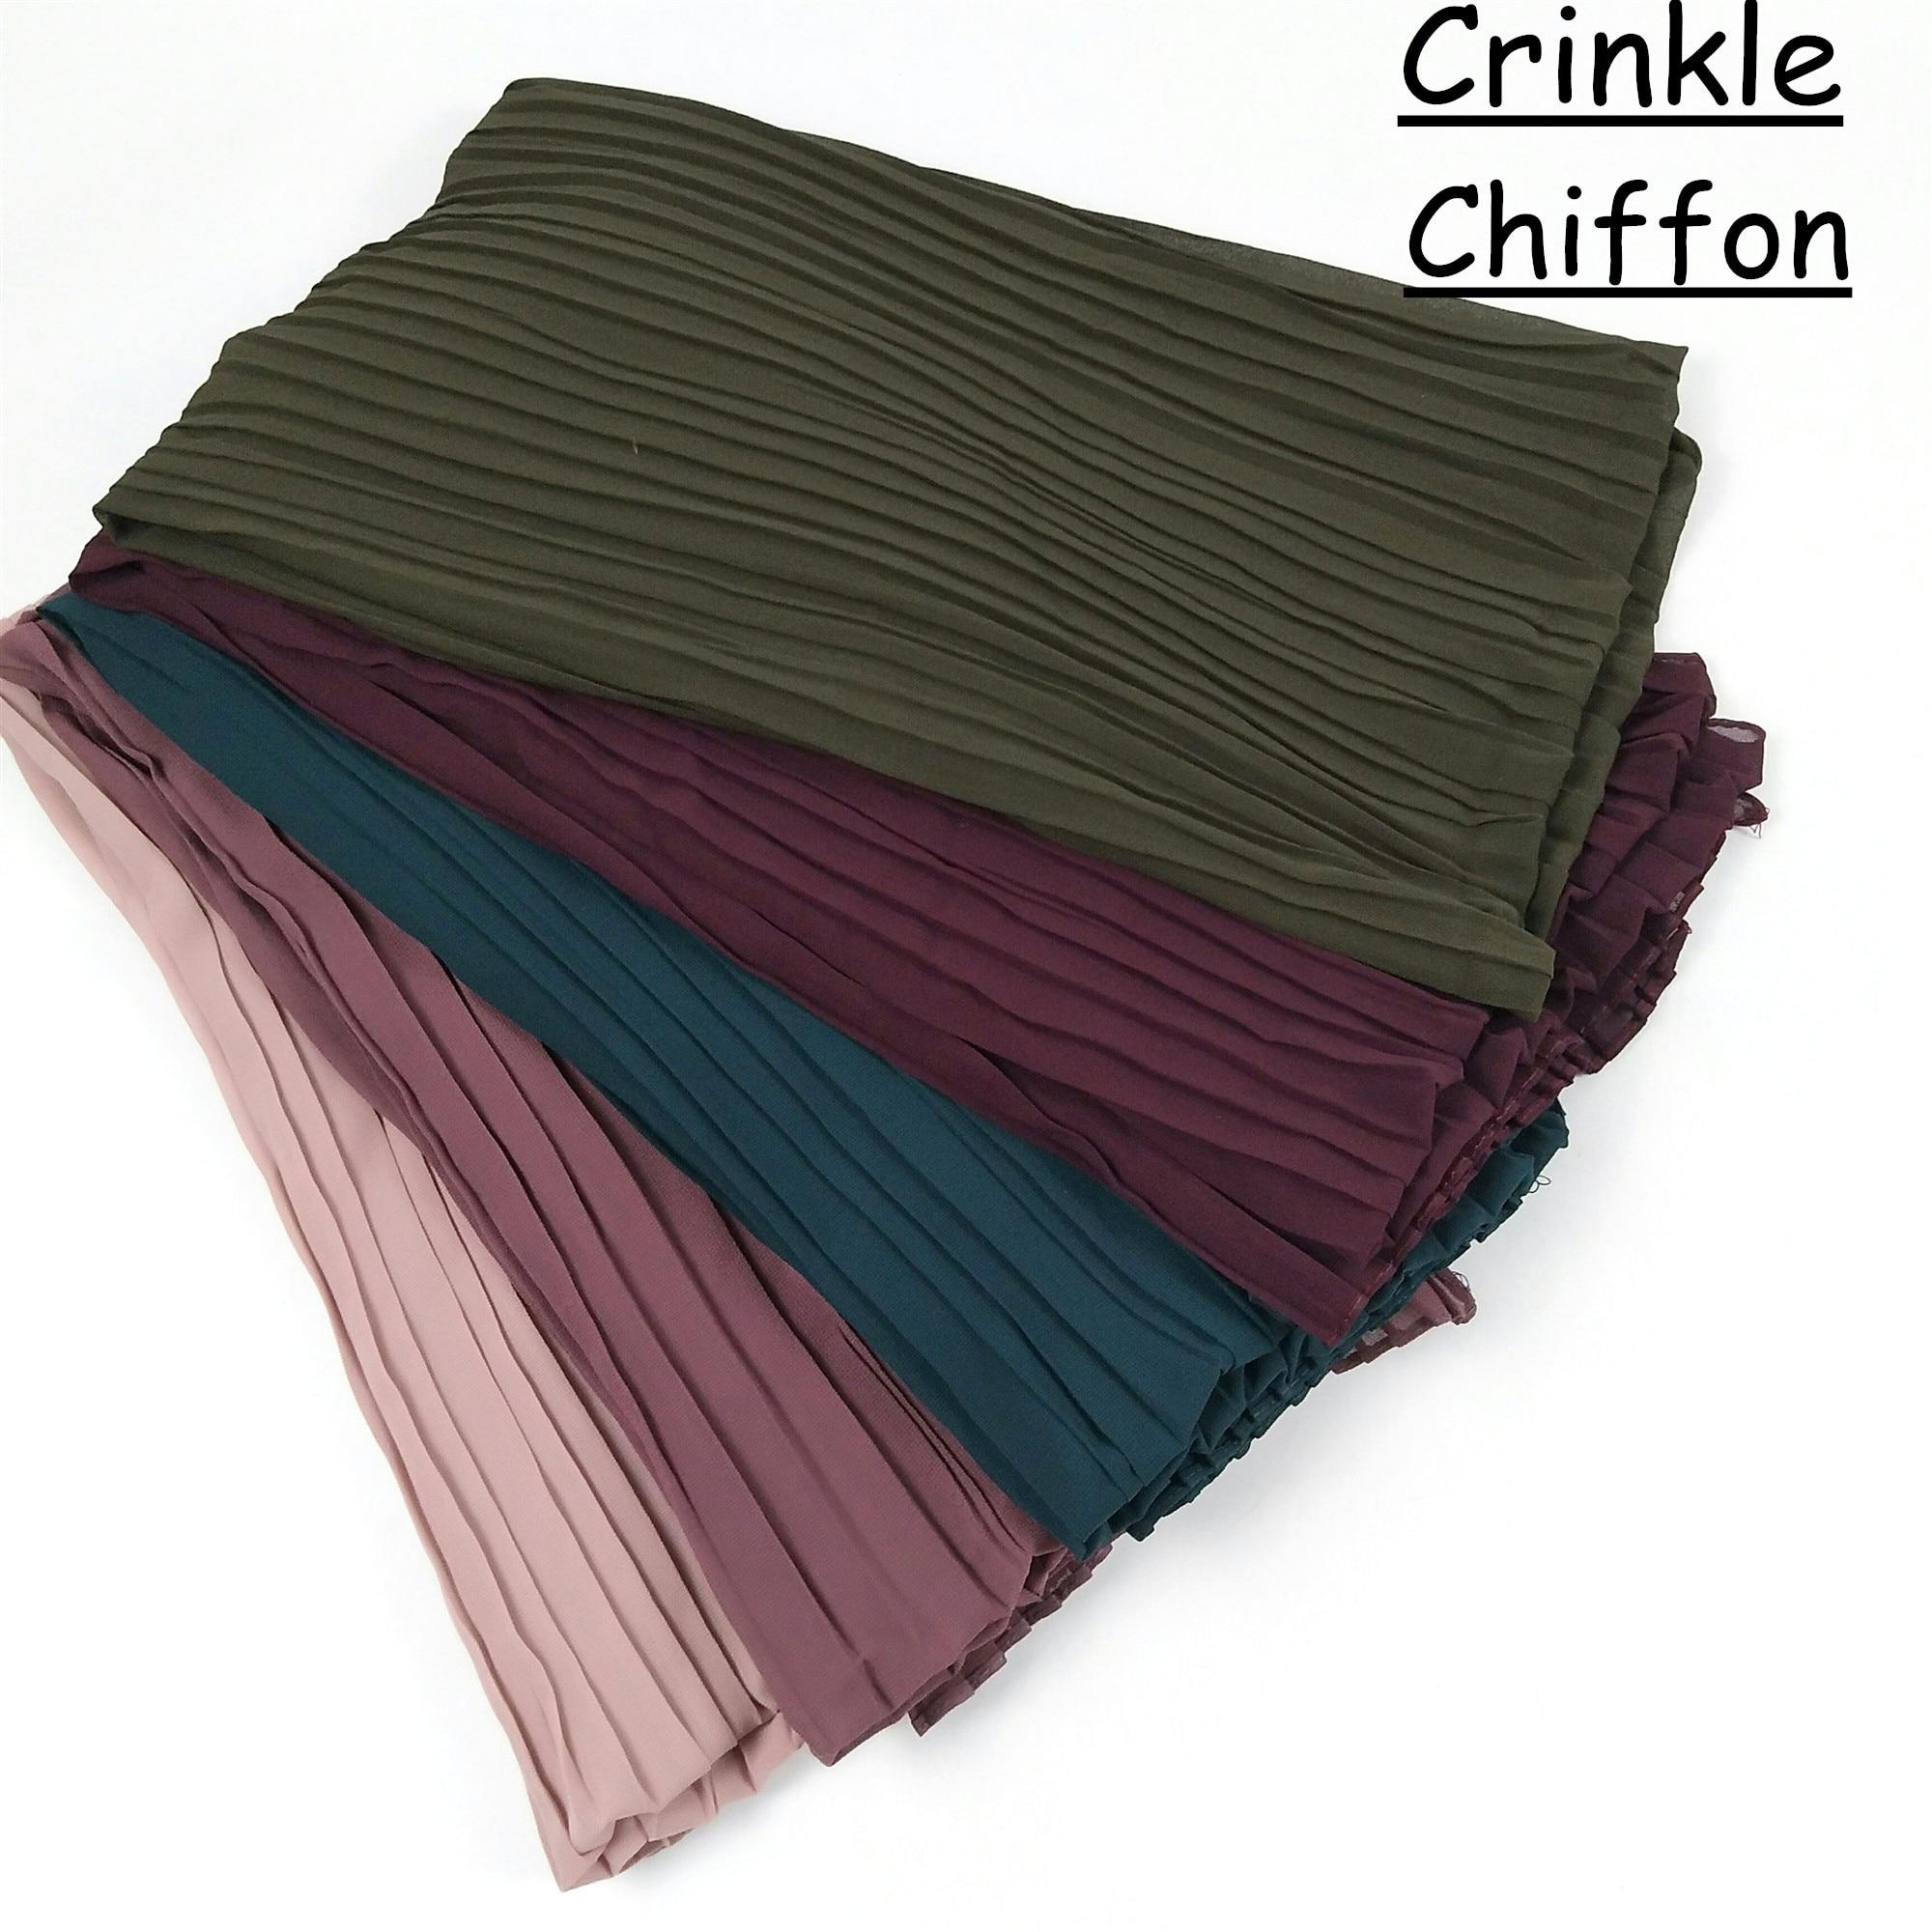 S93 20PCS High quality crinkle chiffon hijab   scarf     wrap   shawls chiffon hijab long   wrap   headband